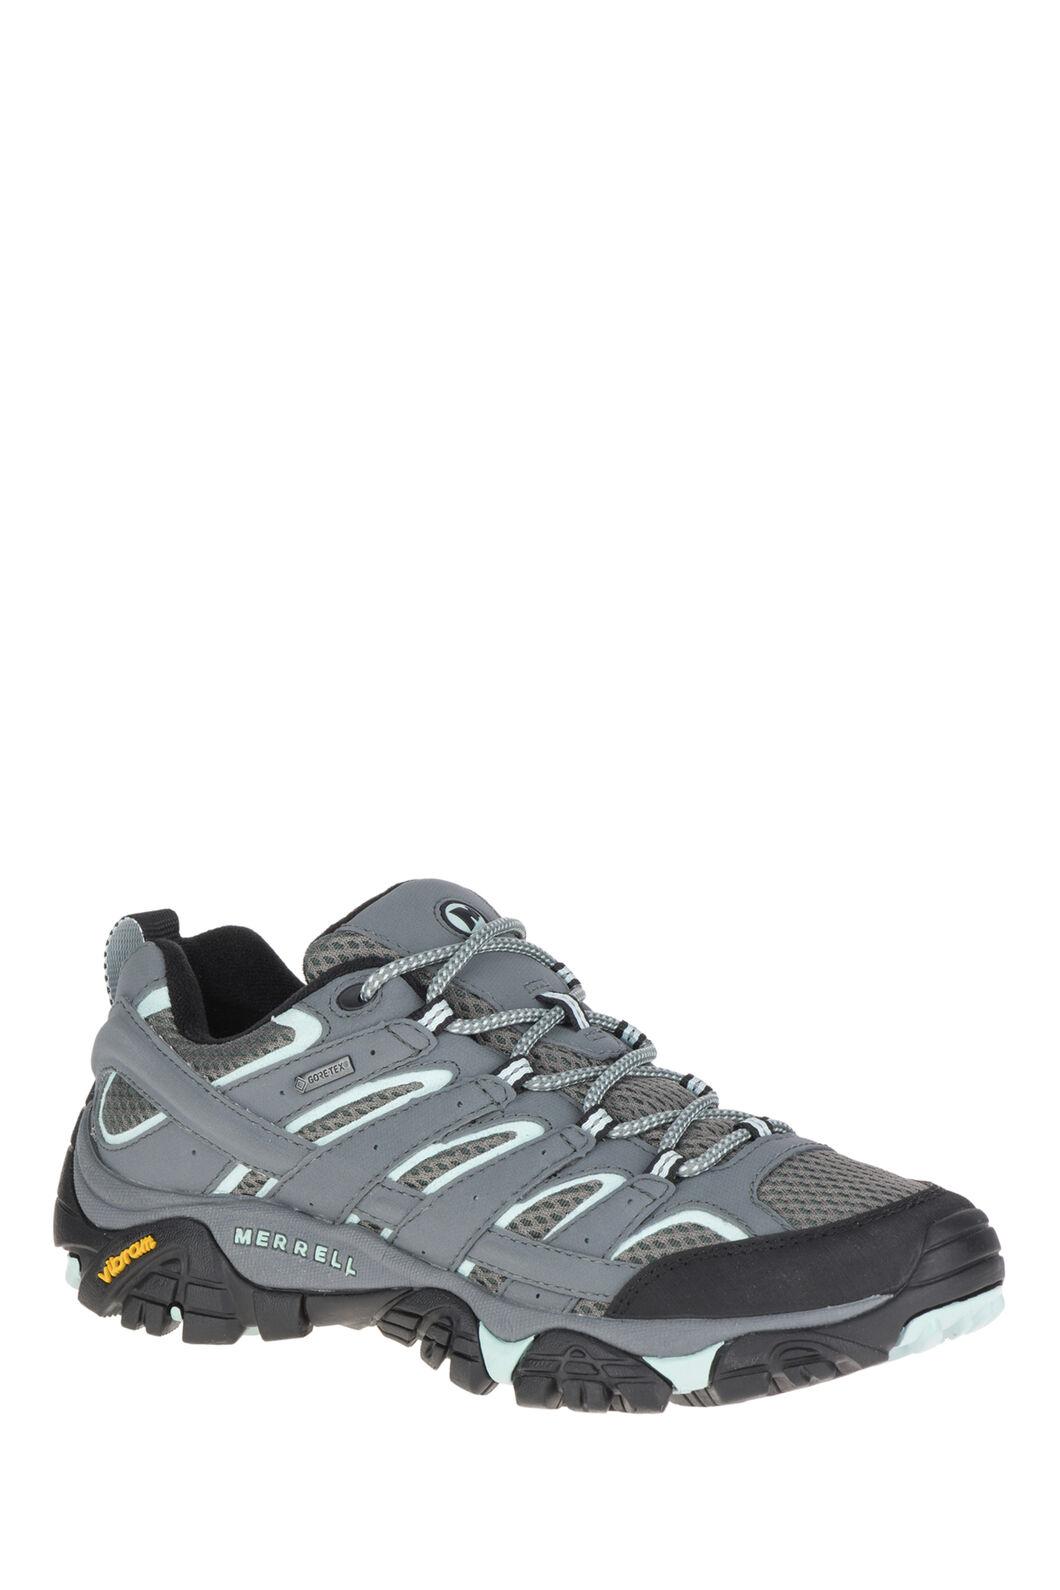 Merrell Moab 2 GTX Hiking Shoes — Women's, Sedona Sage, hi-res